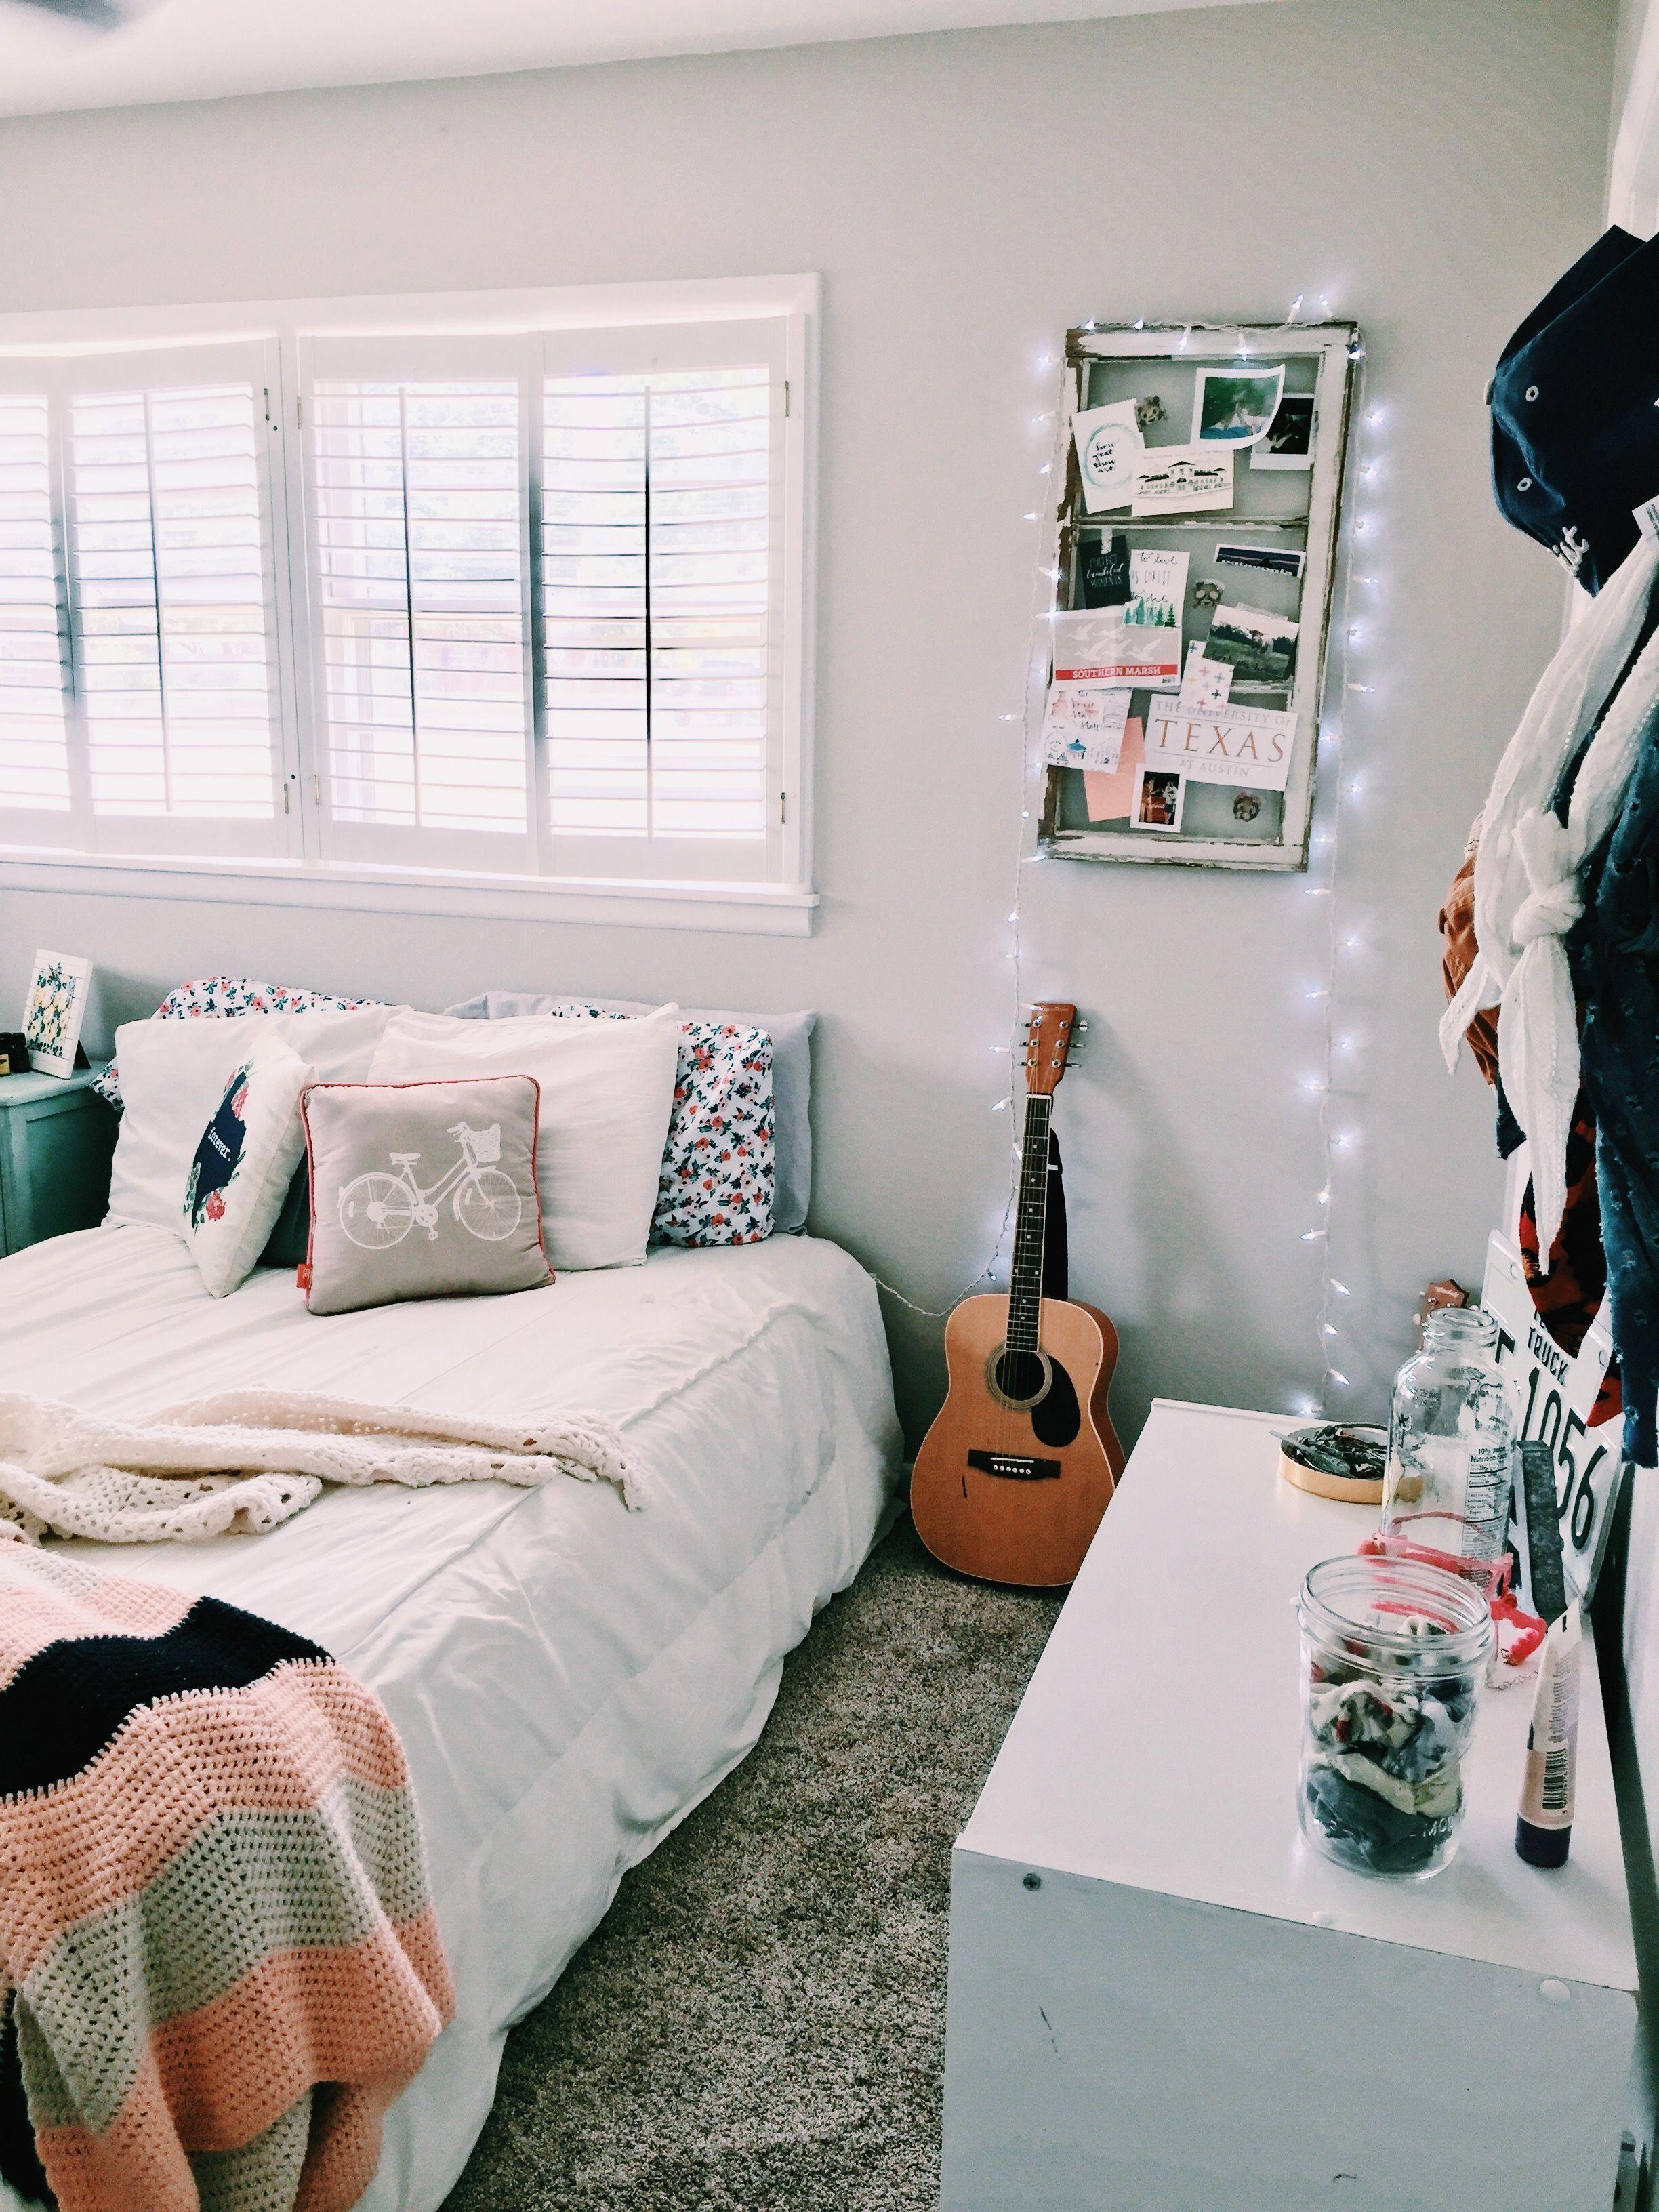 Home Decor Black And White Bedroom Homedecorbedroom Room